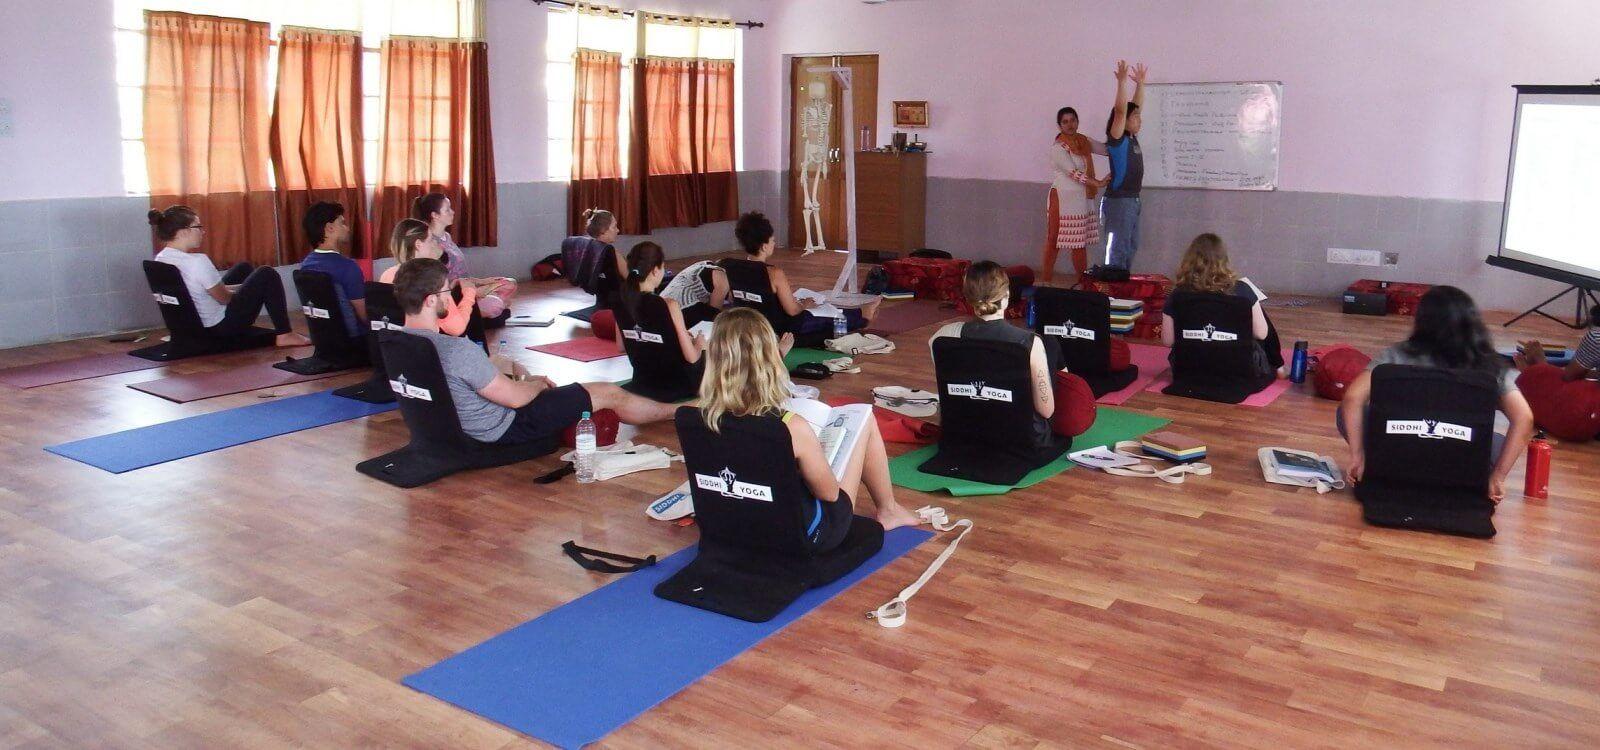 indian yoga anatomy teacher dr amrita